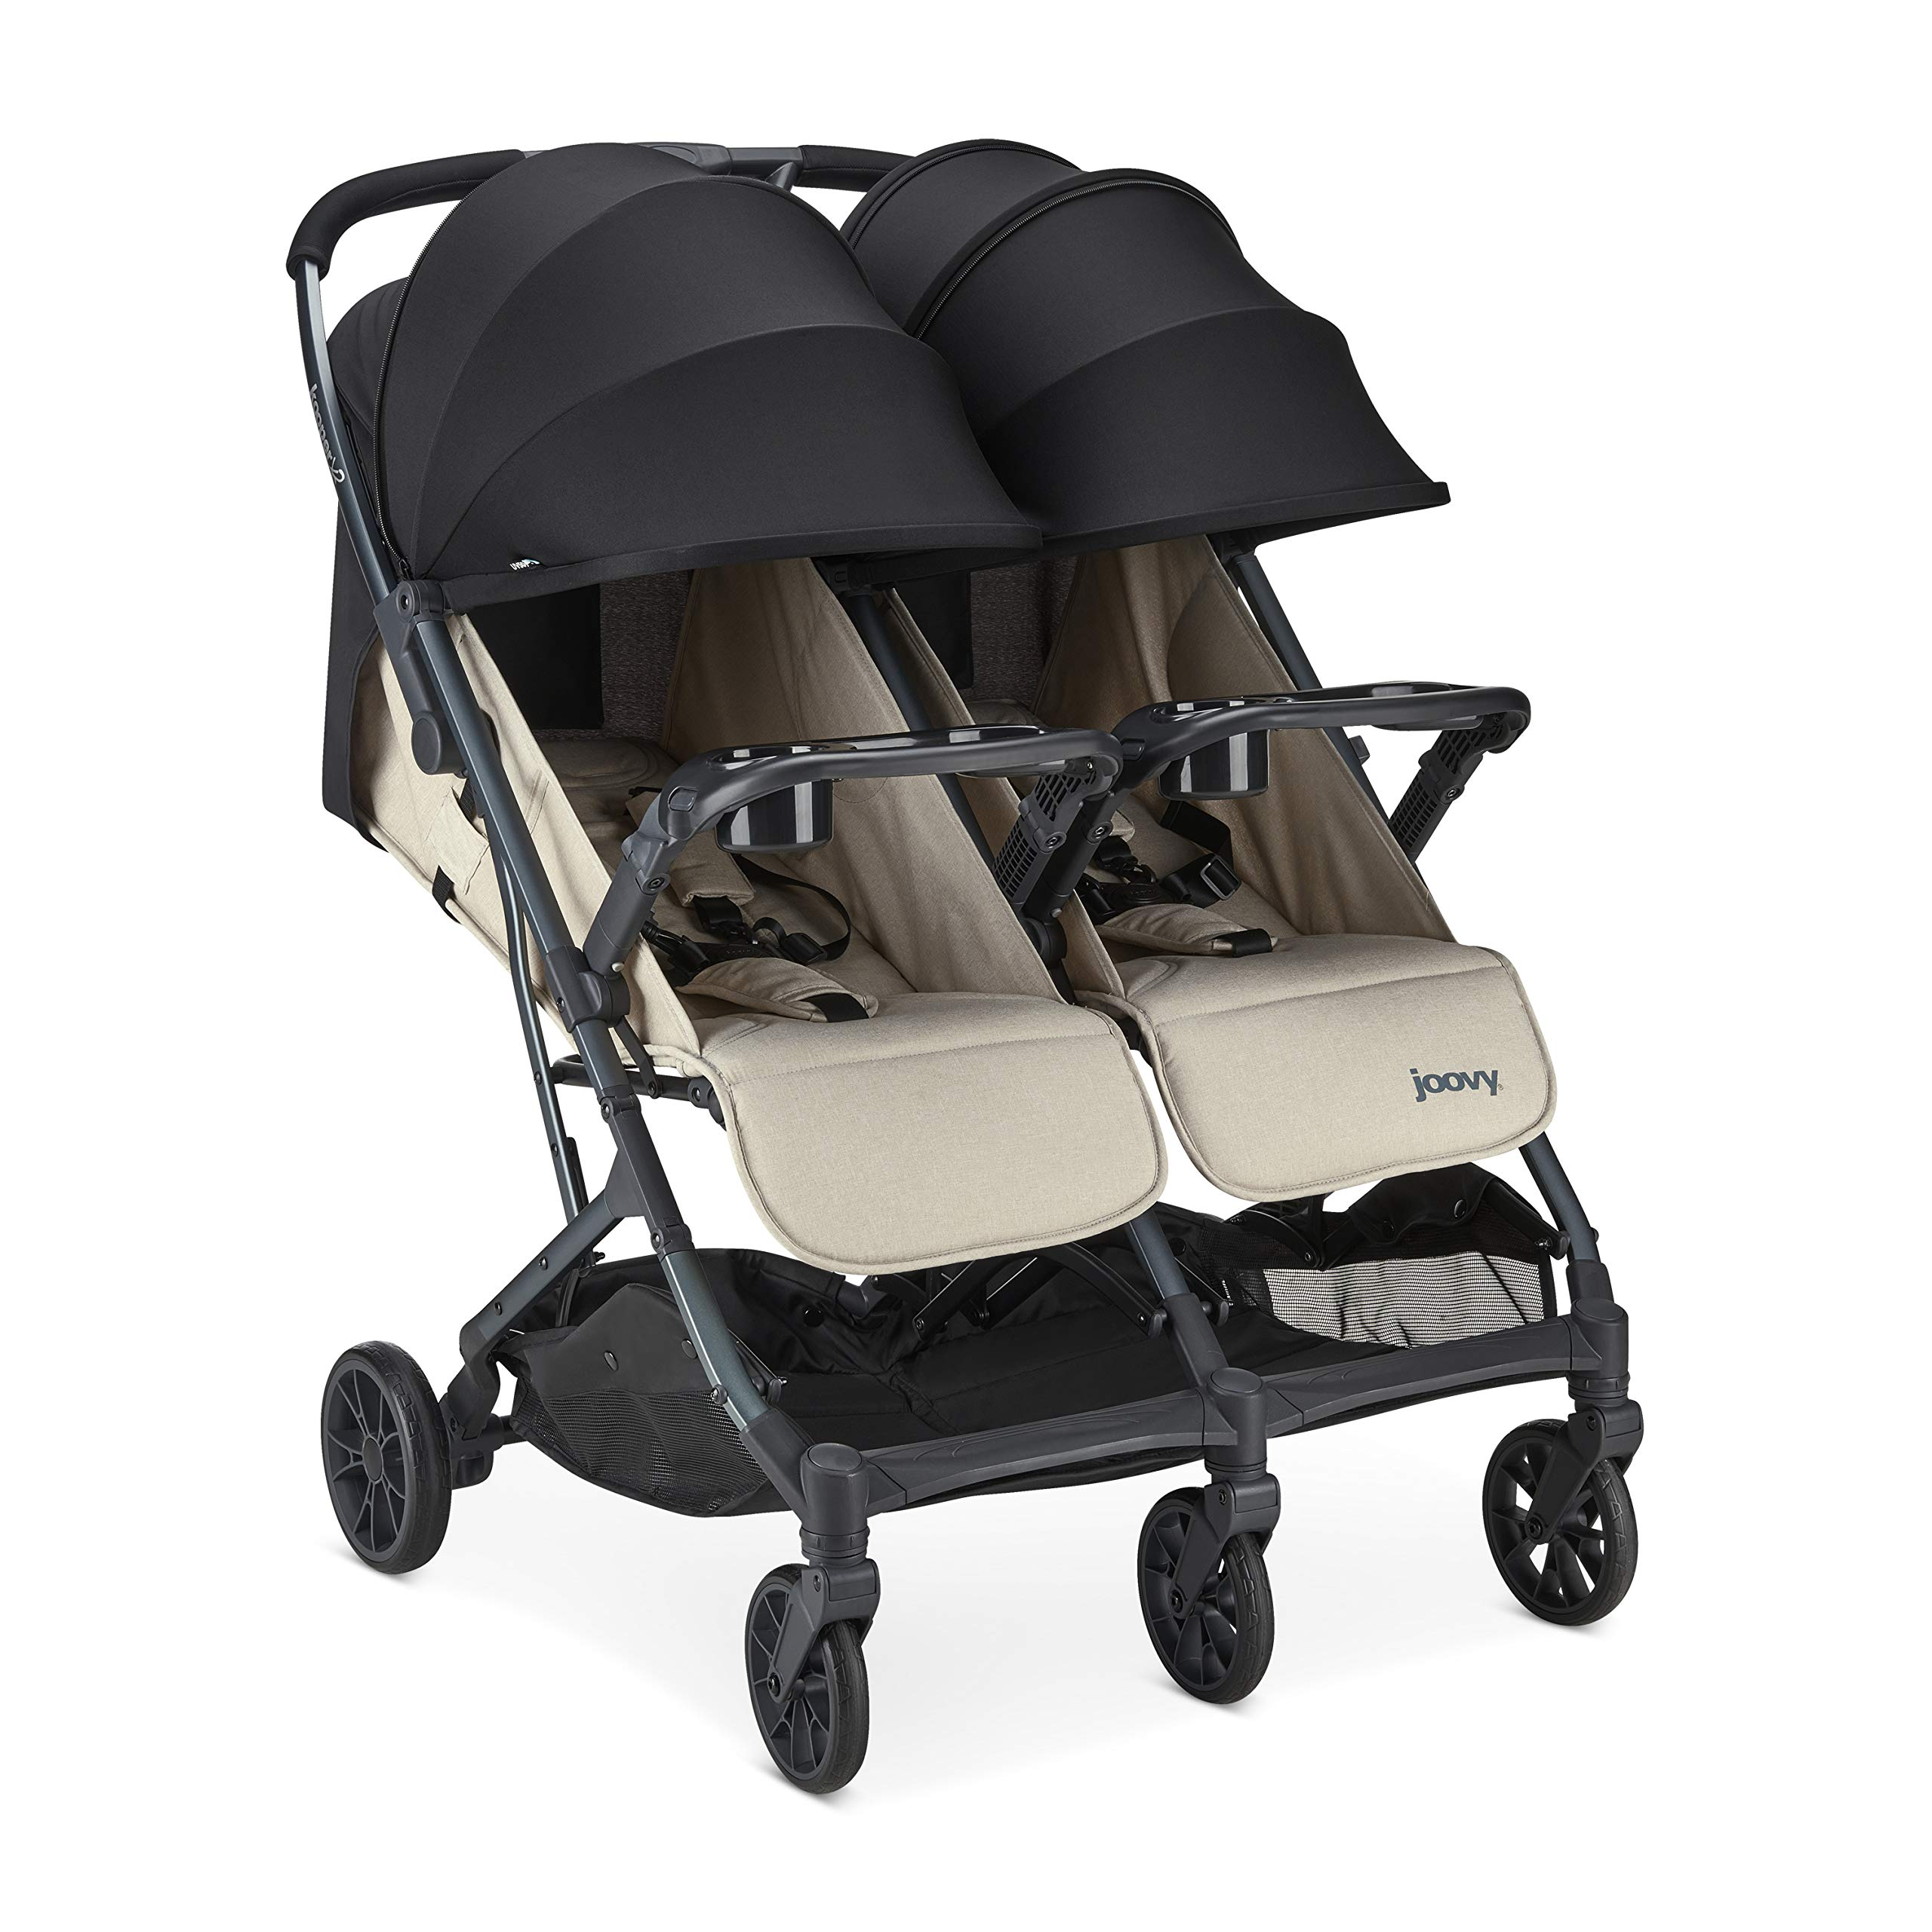 Joovy 8228 Kooper X2 Stroller, Sand